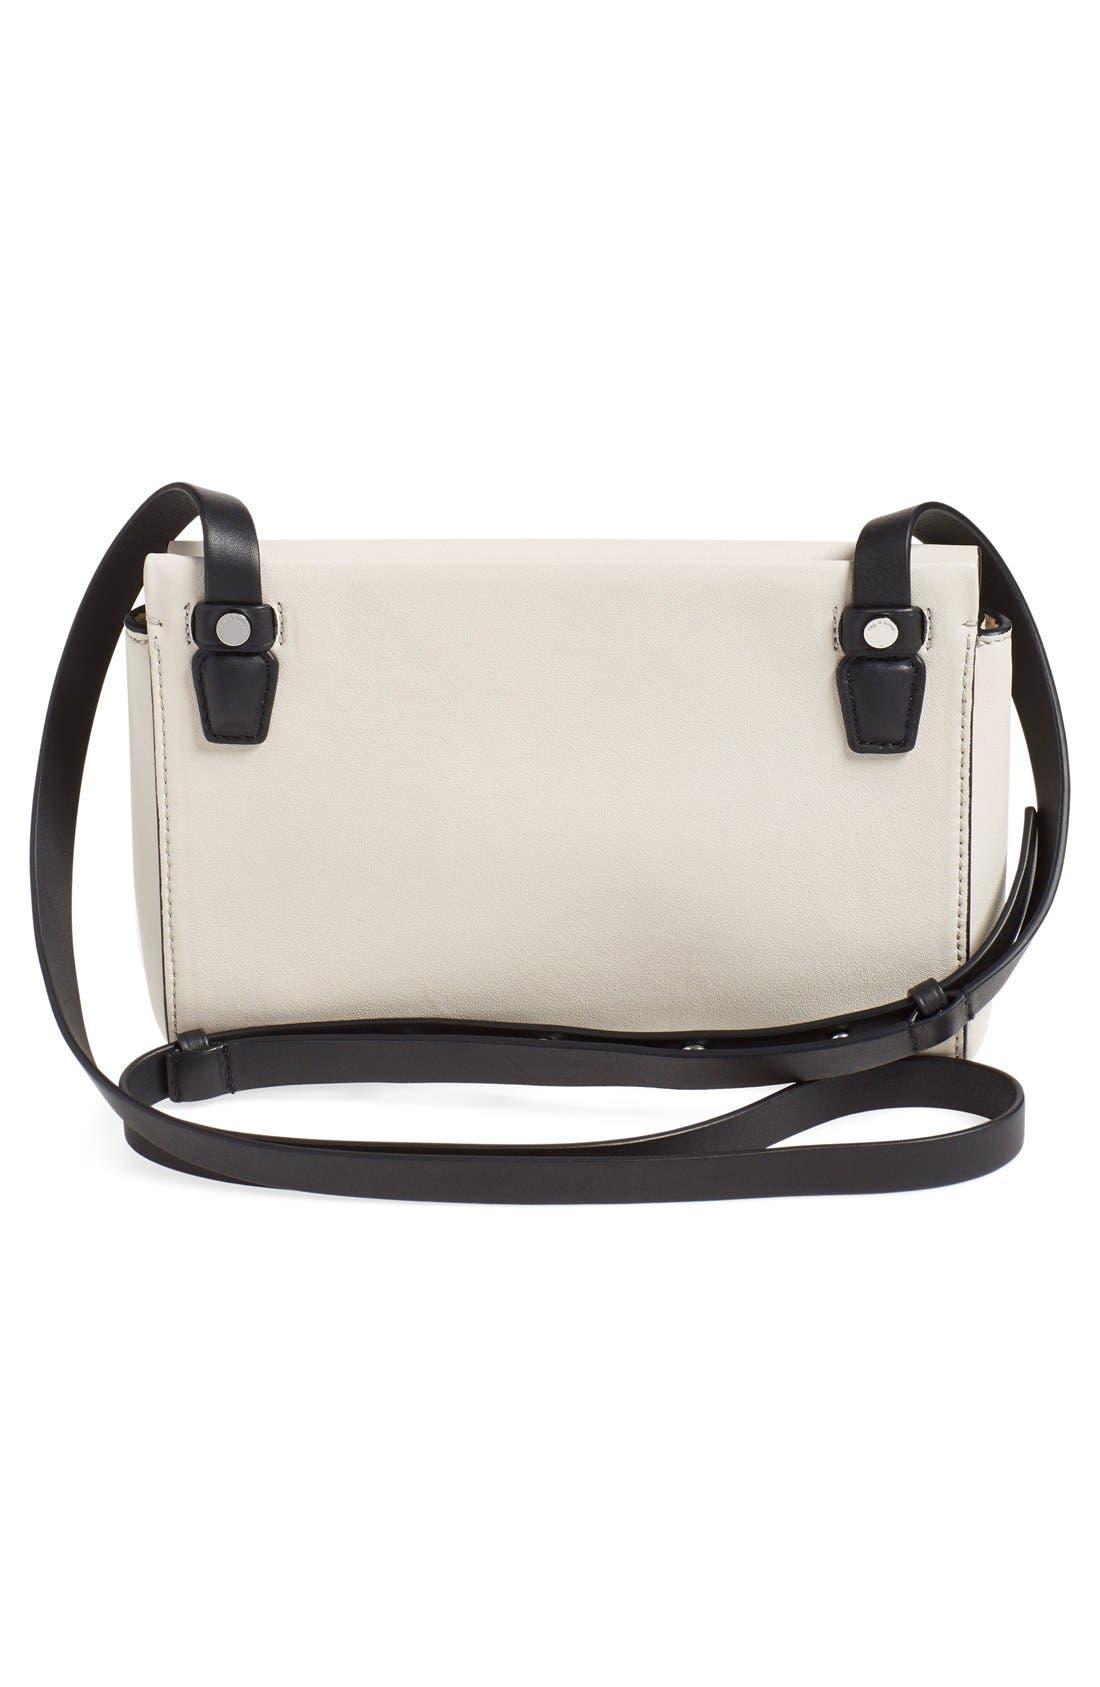 Alternate Image 3  - rag & bone 'Mini Aston' Leather Crossbody Bag